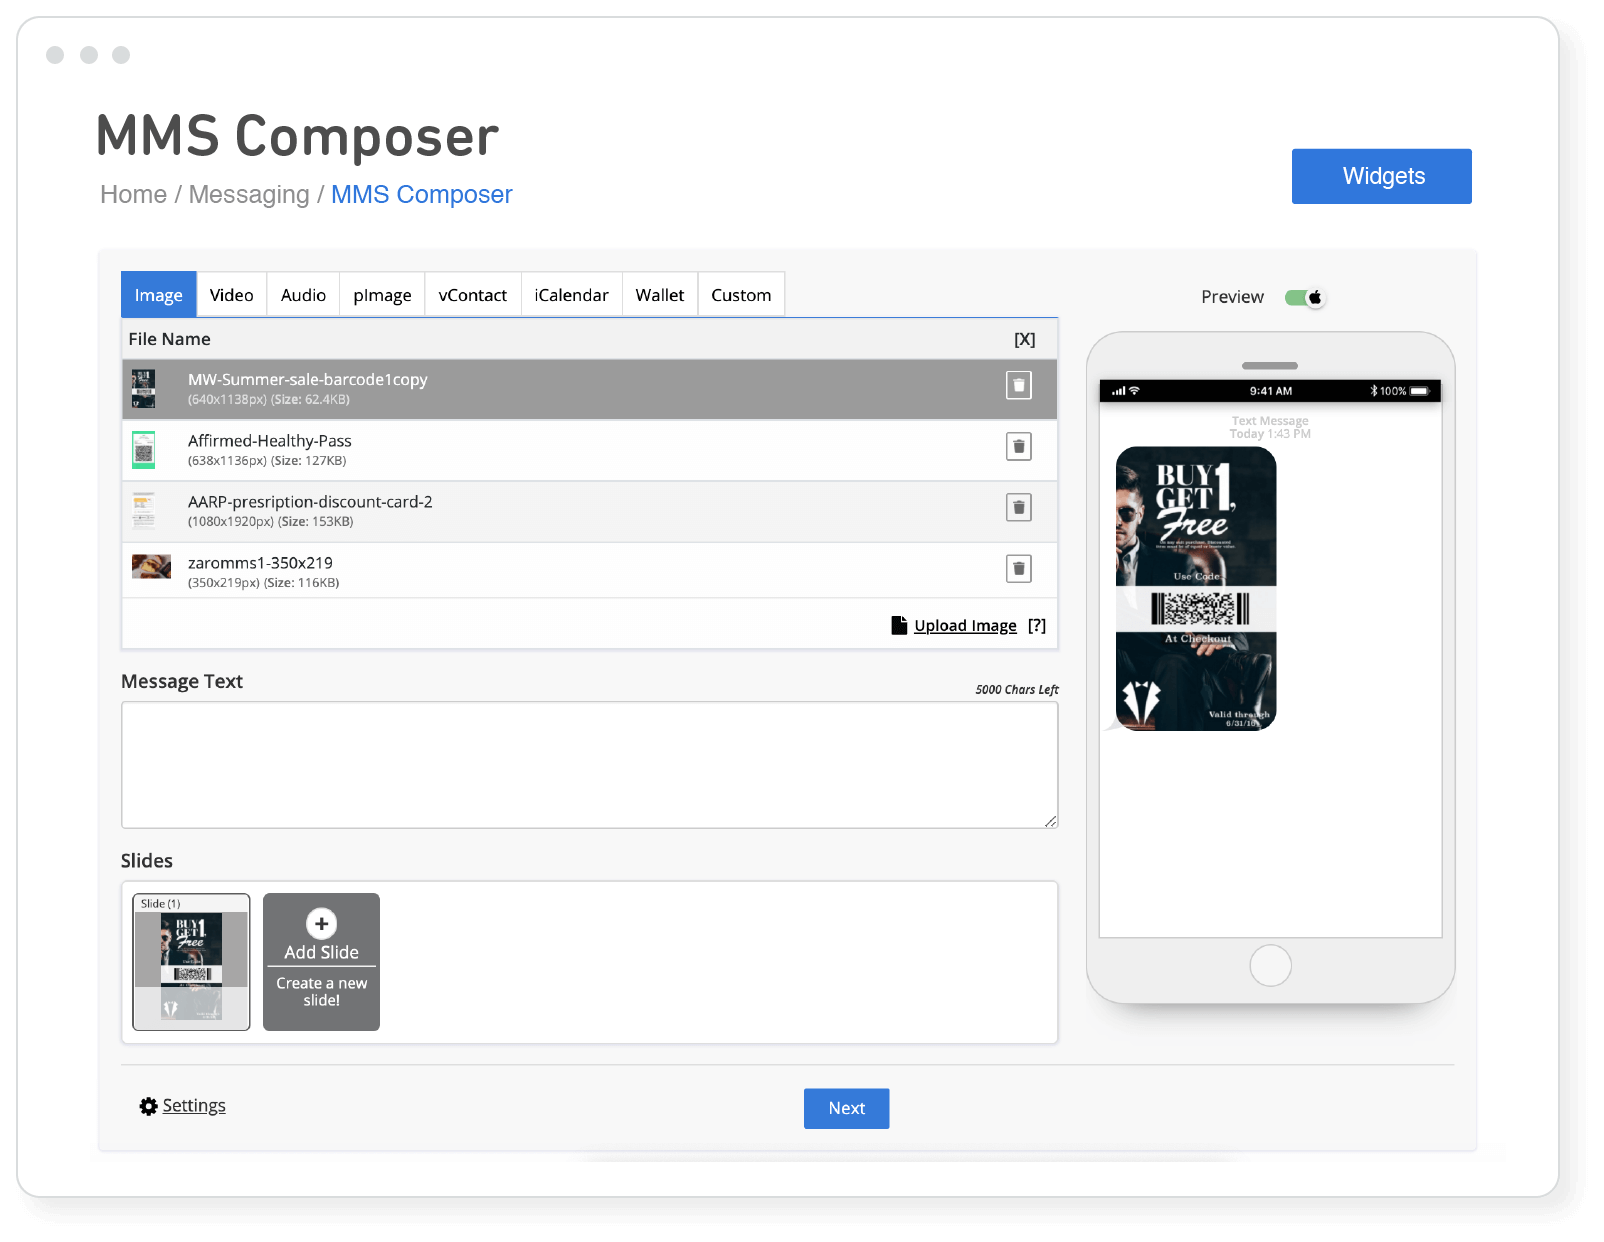 MMS Composer